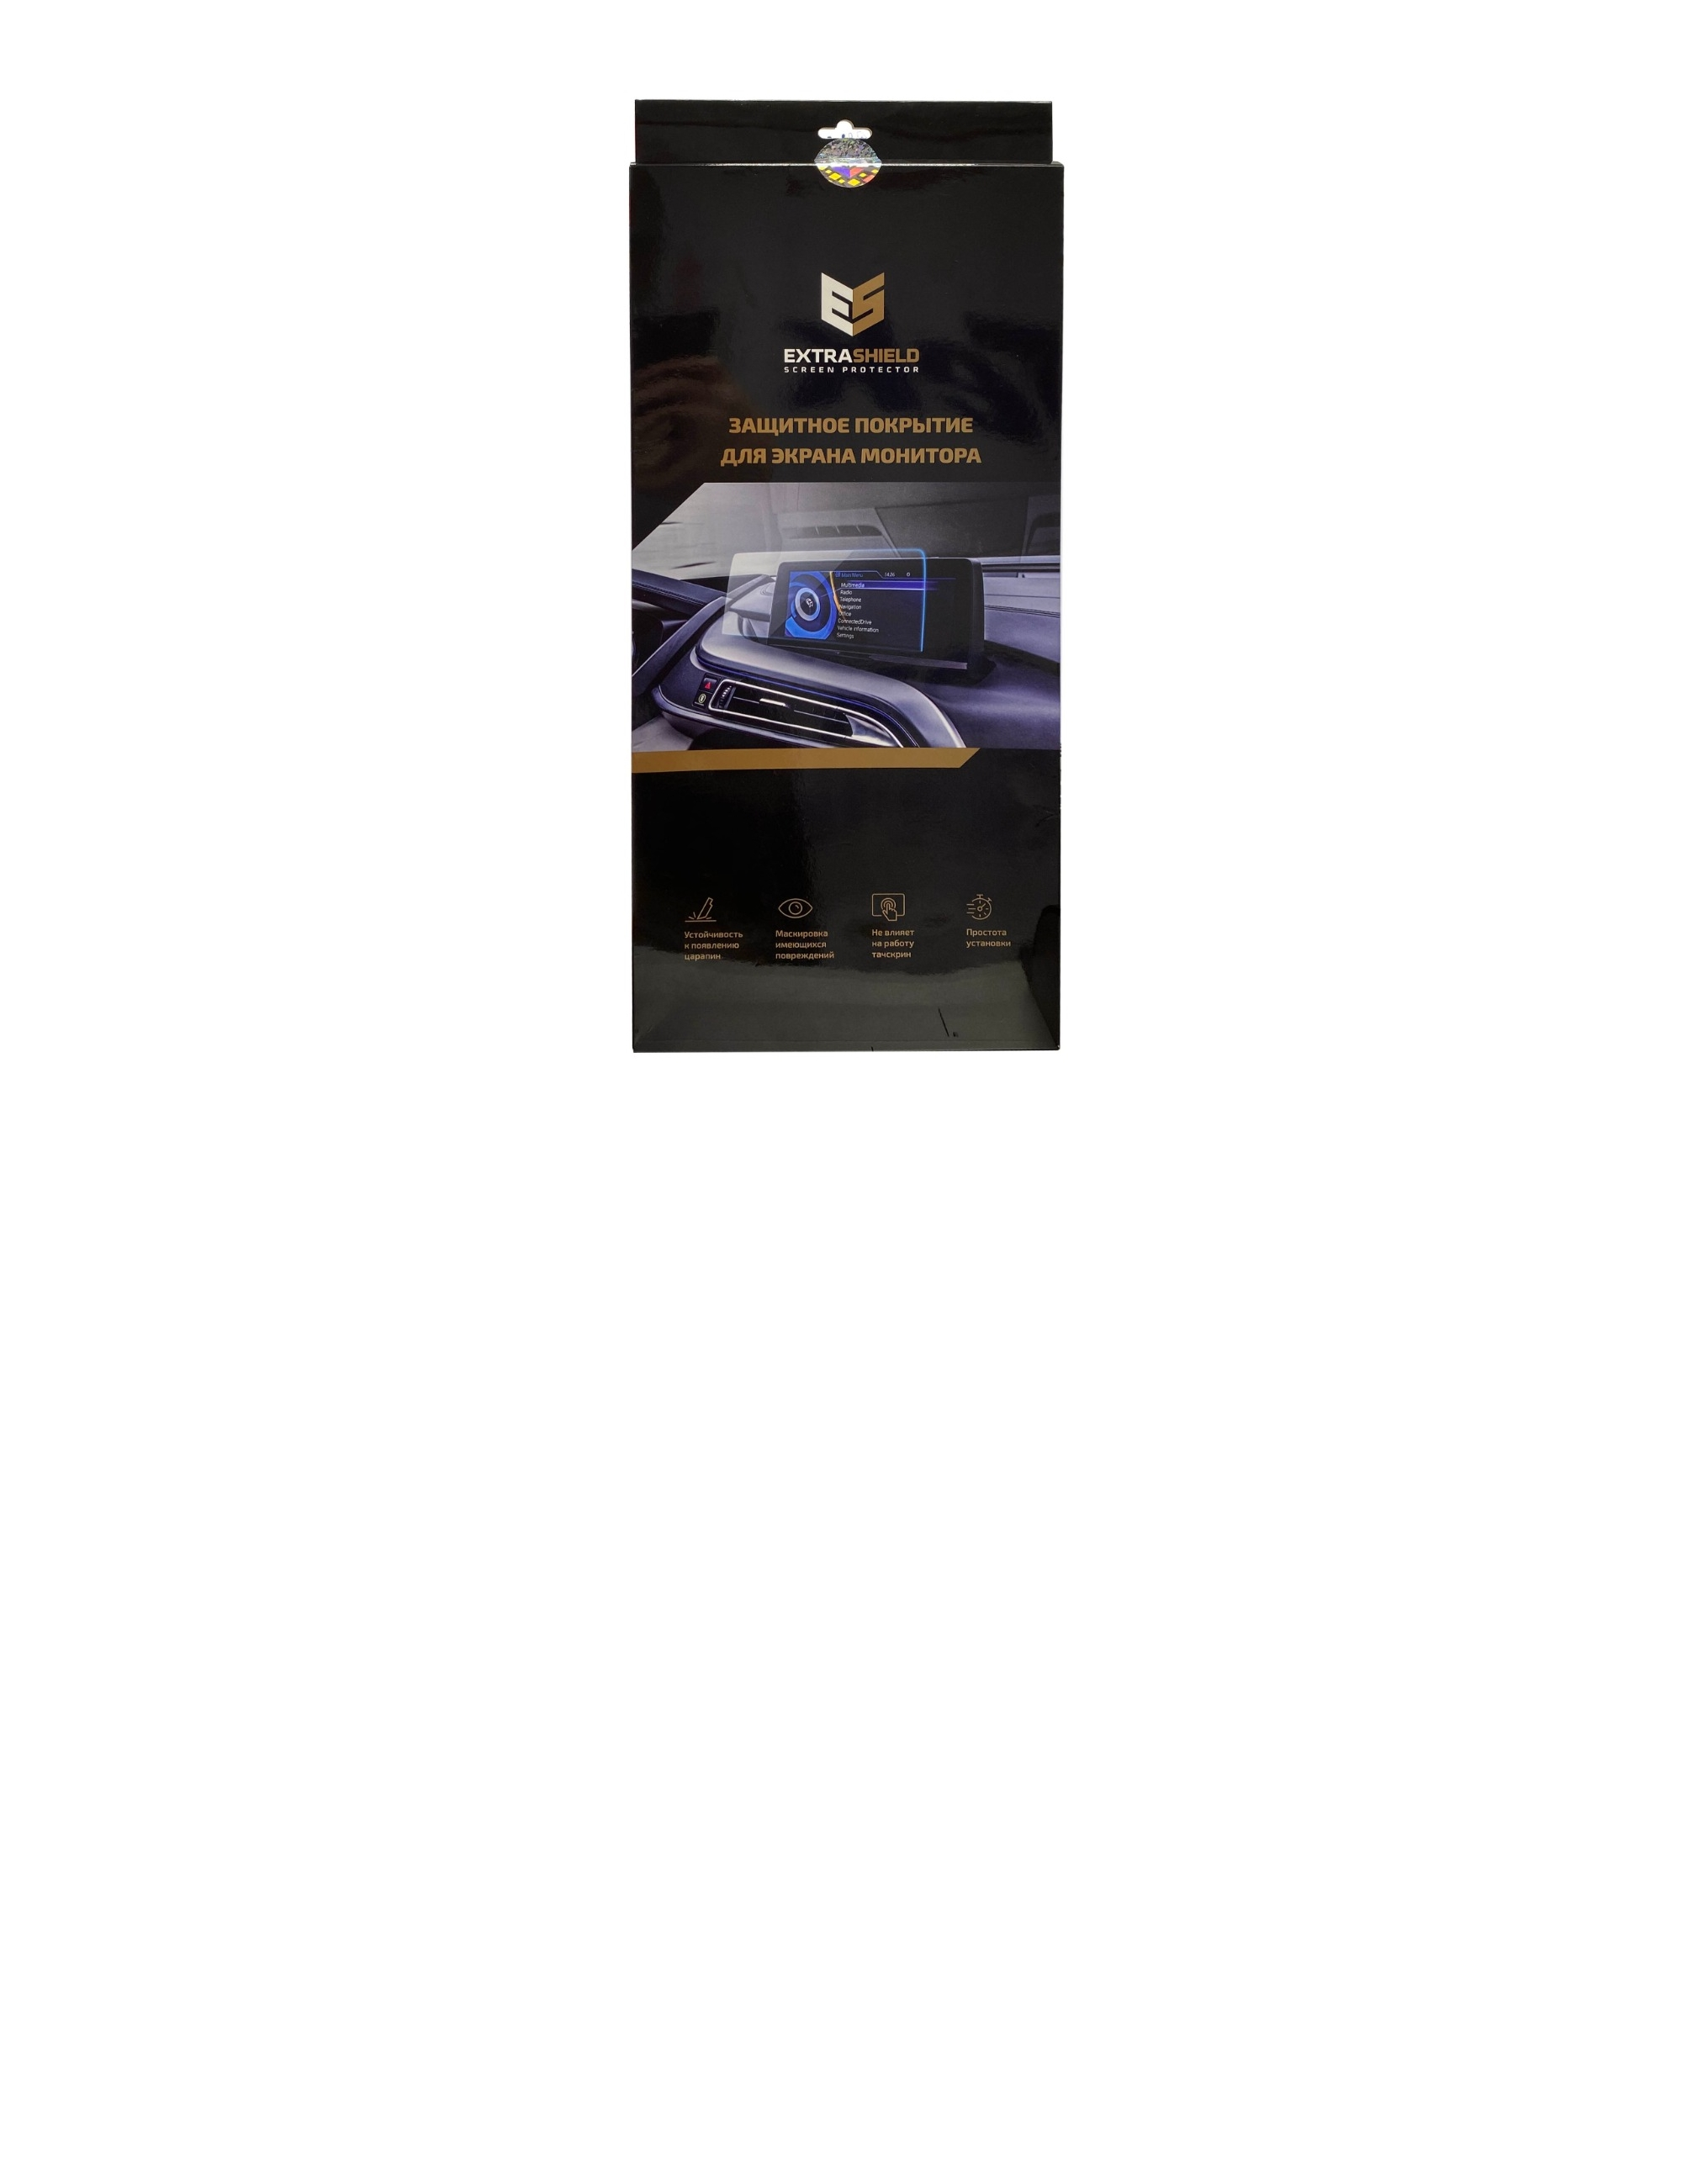 BMW 7 серия (F01/ F02) 2012 - 2015 мультимедиа NBT EVO 10.2 Защитное стекло Глянец